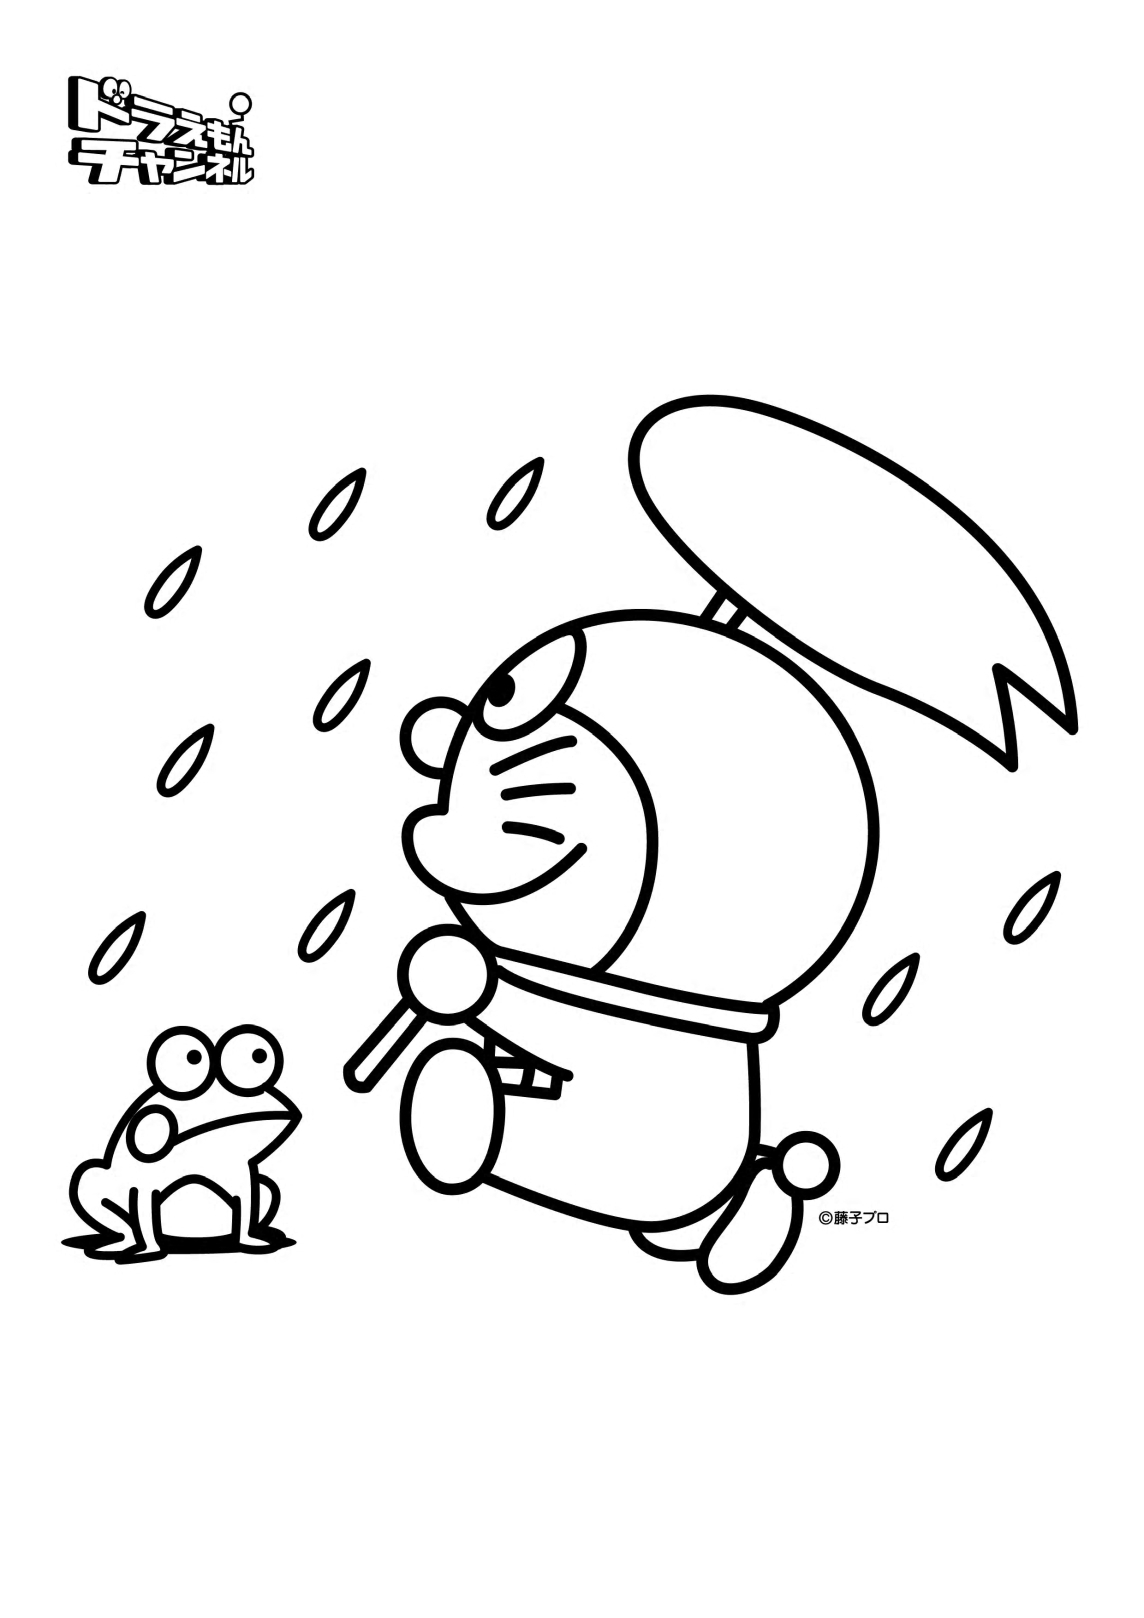 doraemon coloring games online : Coloring Book Doraemon Doraemon Coloring Book006 Jpg